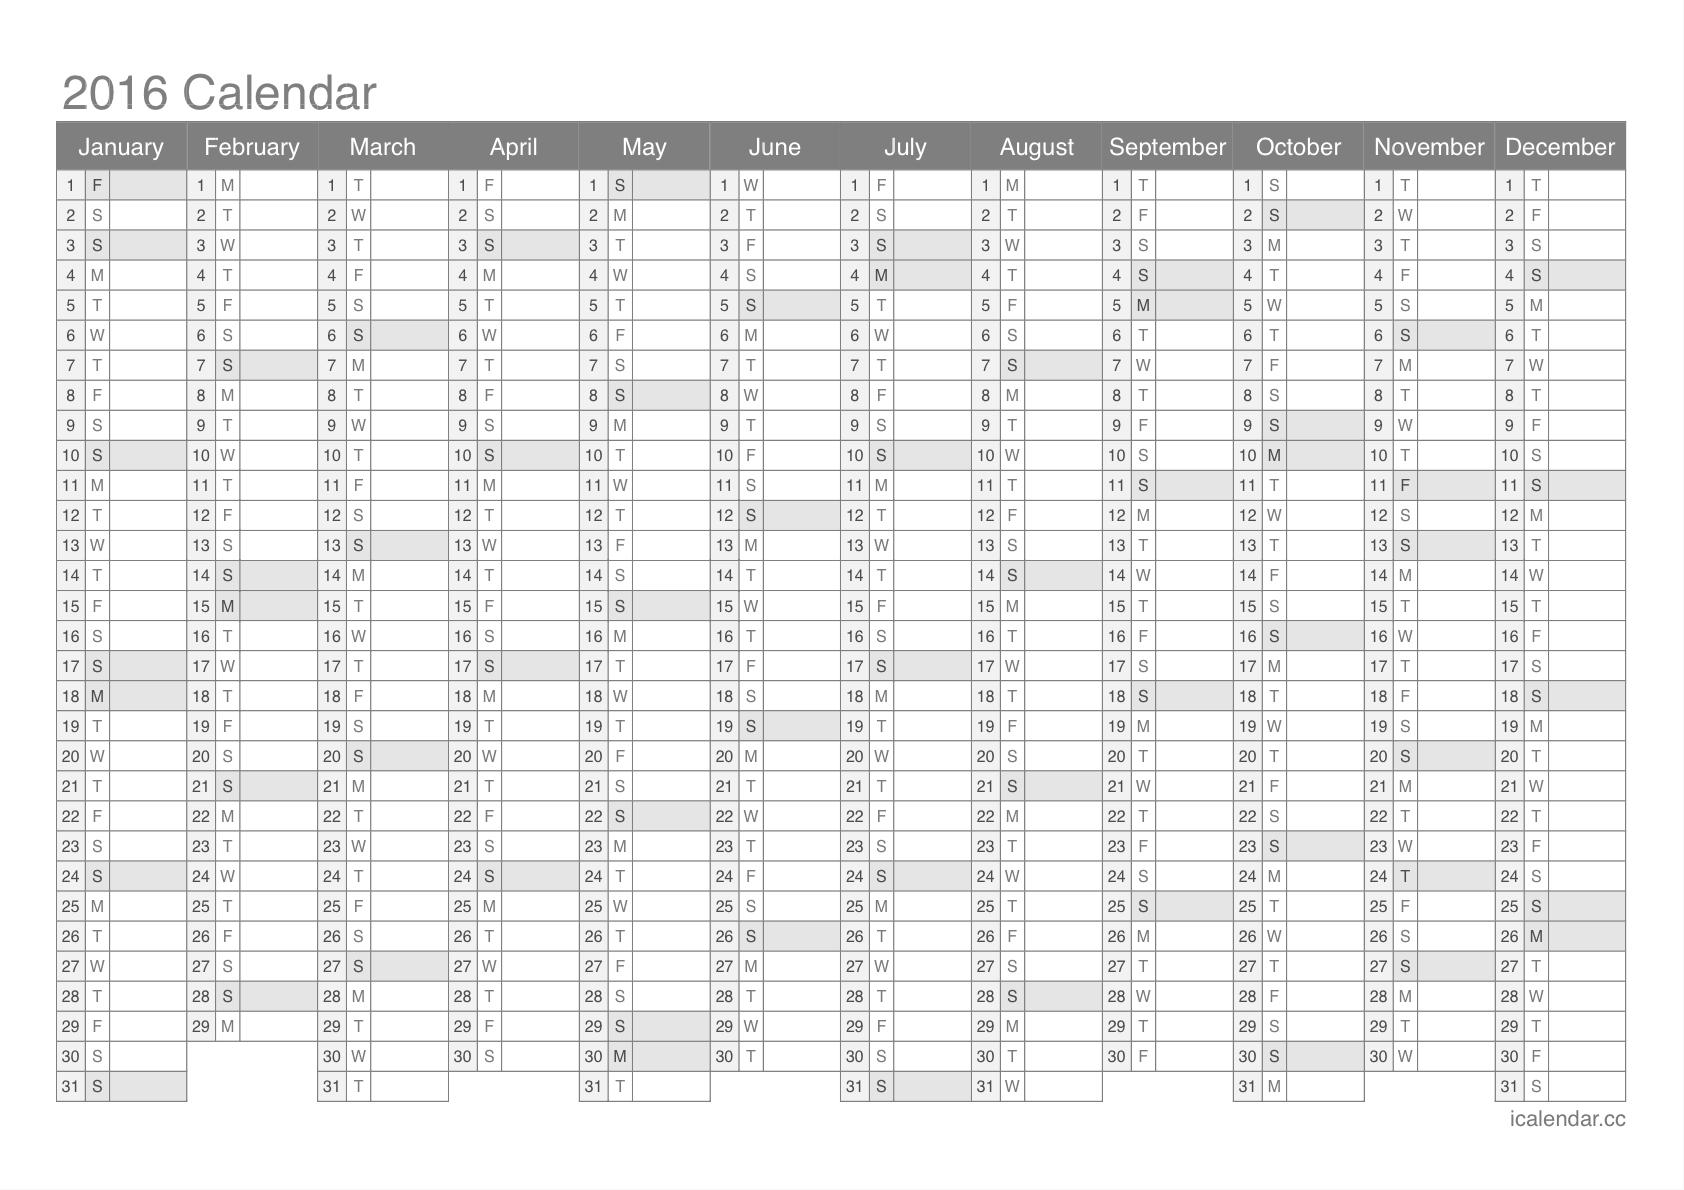 Yearly Calendar Printable 2016 | printable calendar templates